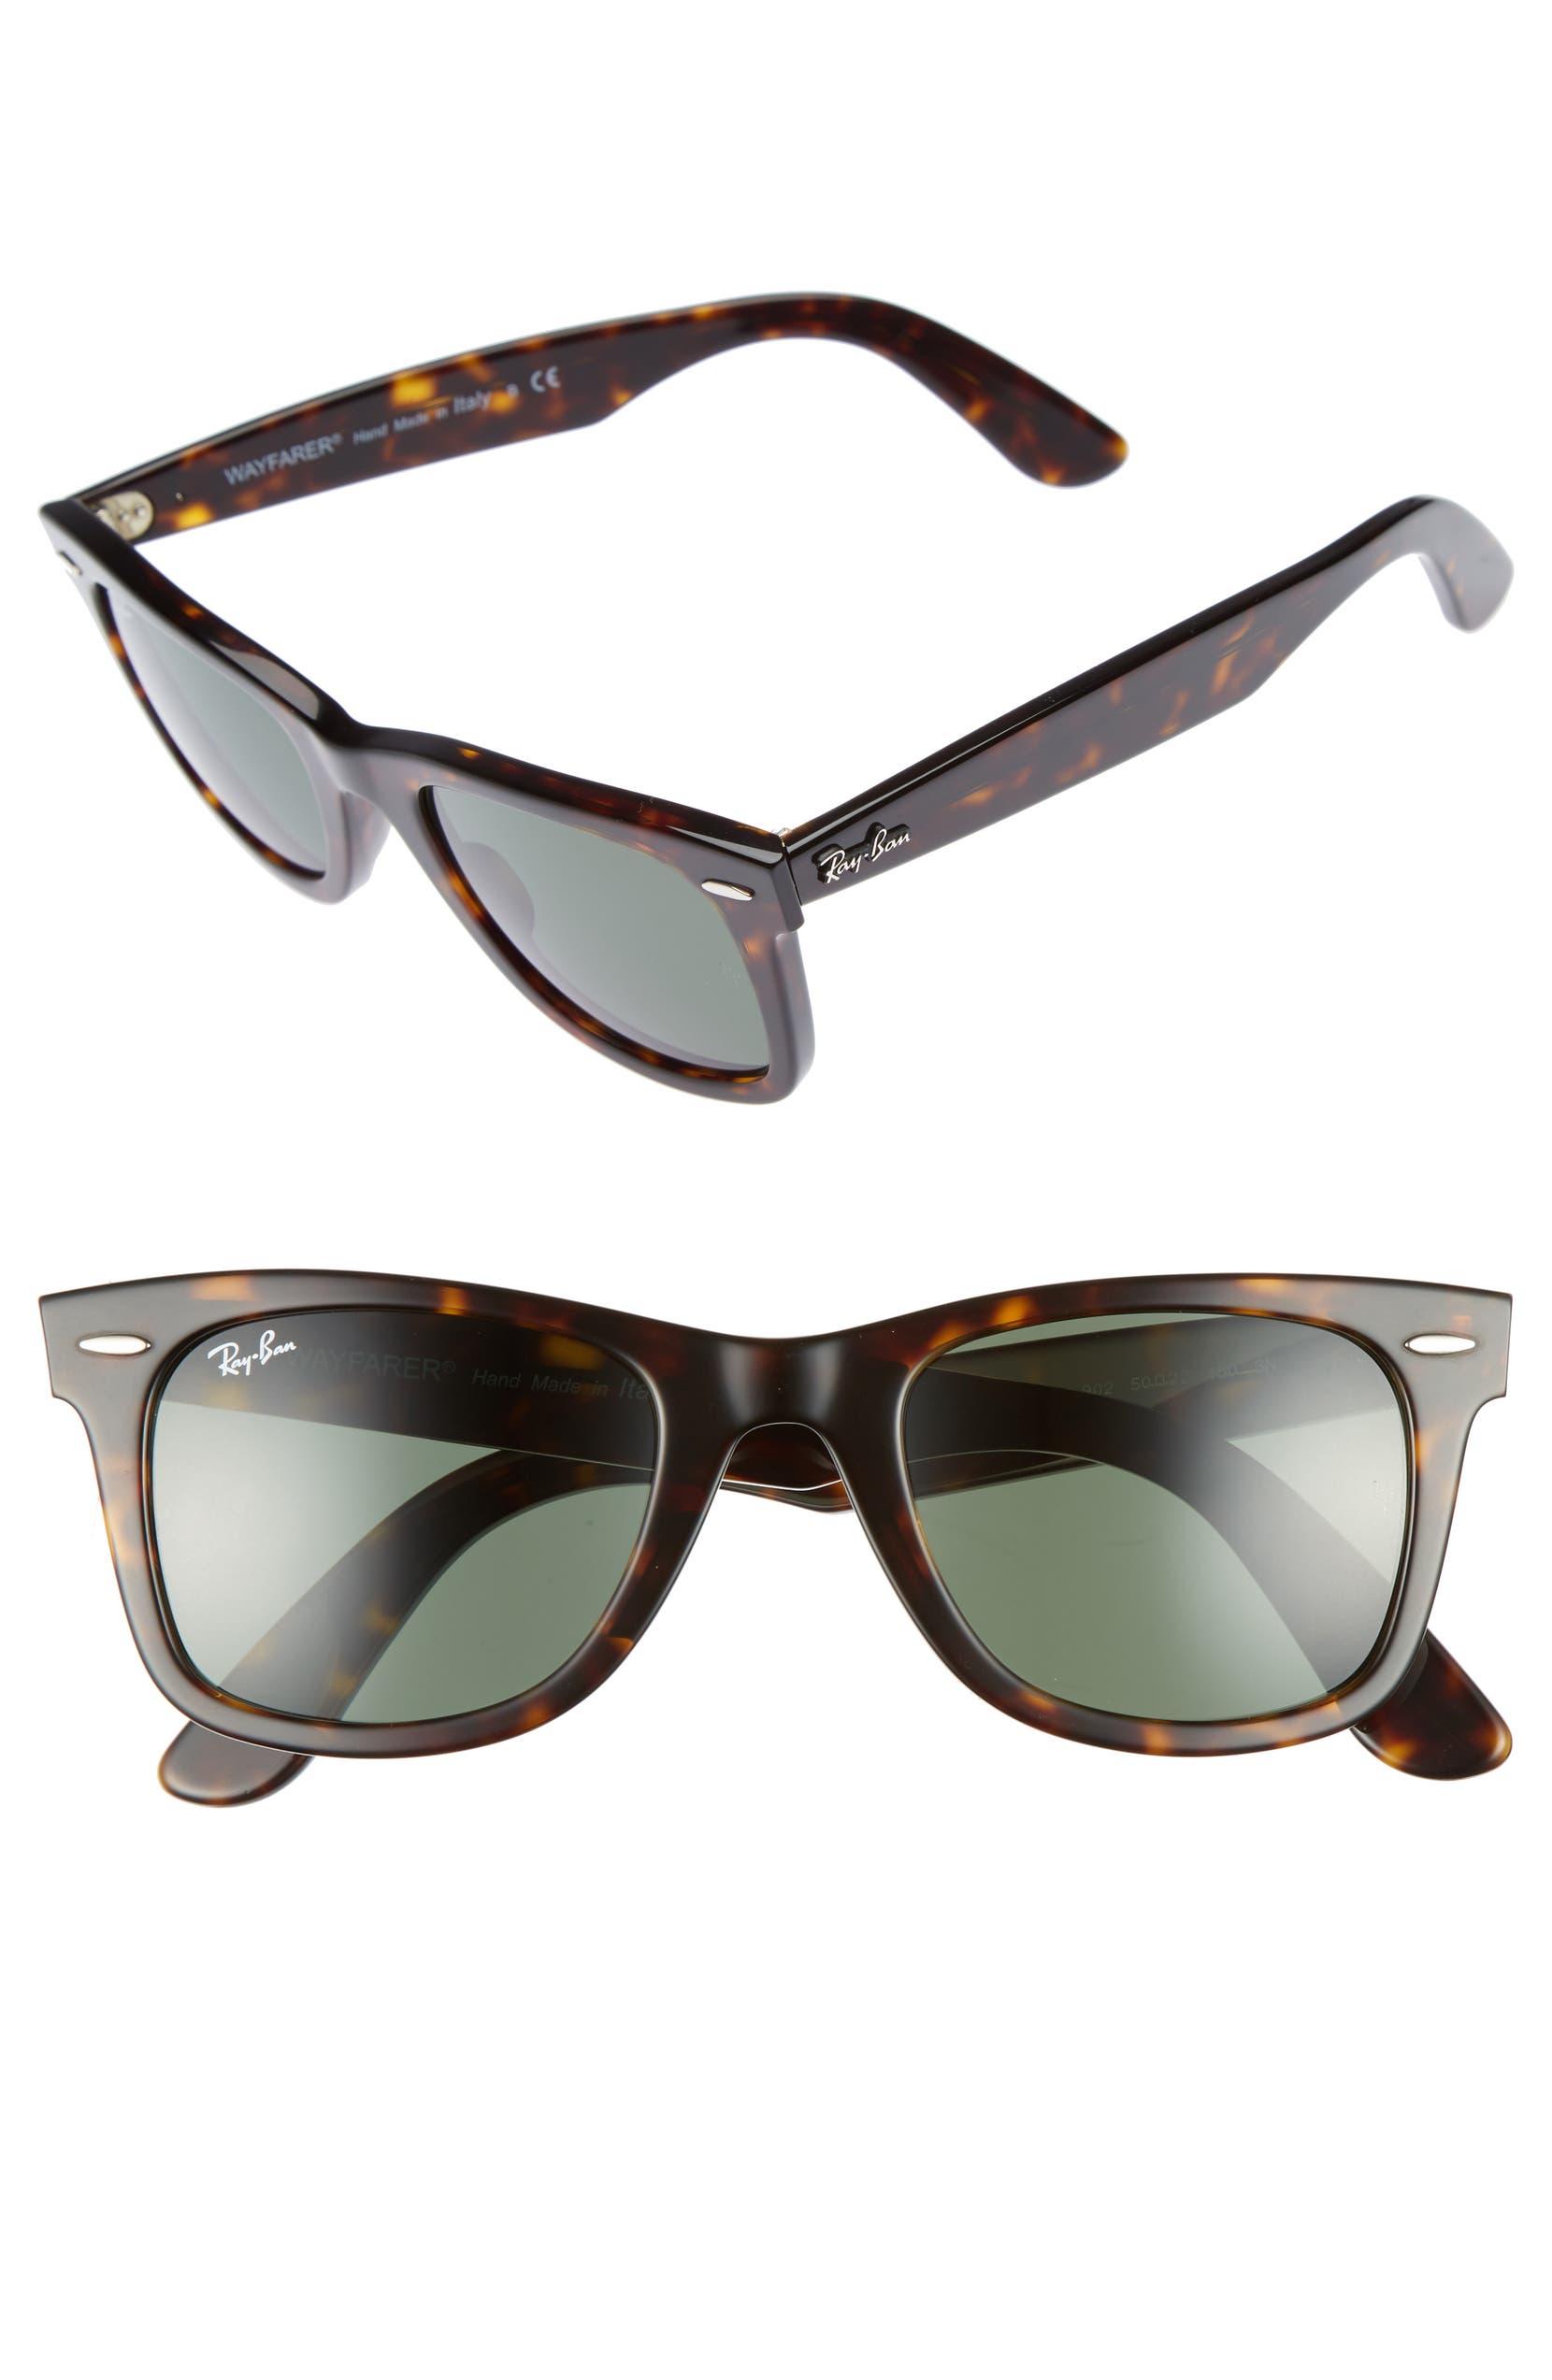 8639a82c0e6 Ray-Ban  Classic Wayfarer  50mm Sunglasses